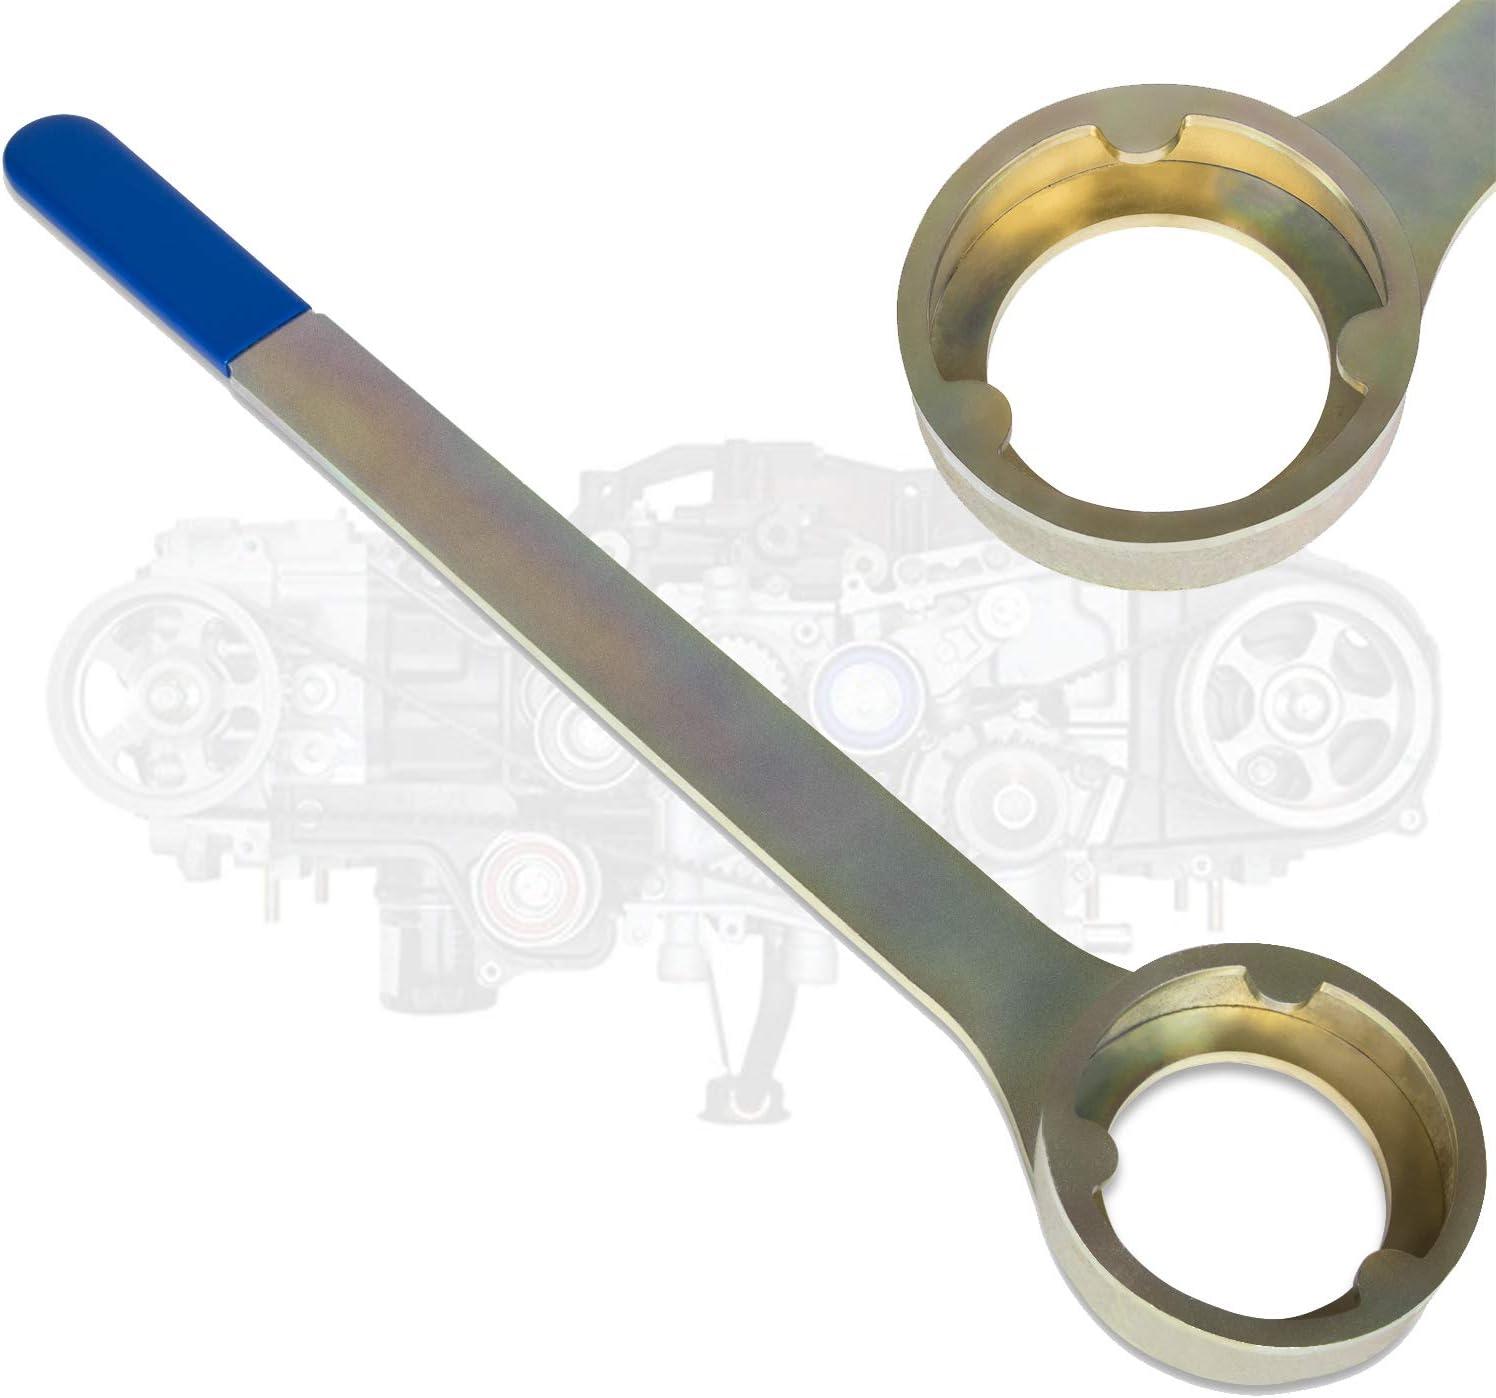 Cam Sprocket Tool Crank Wrench Holder Kit For Subaru Impreza WRX STI Forester XT Legacy GT Baja Turbo Opall